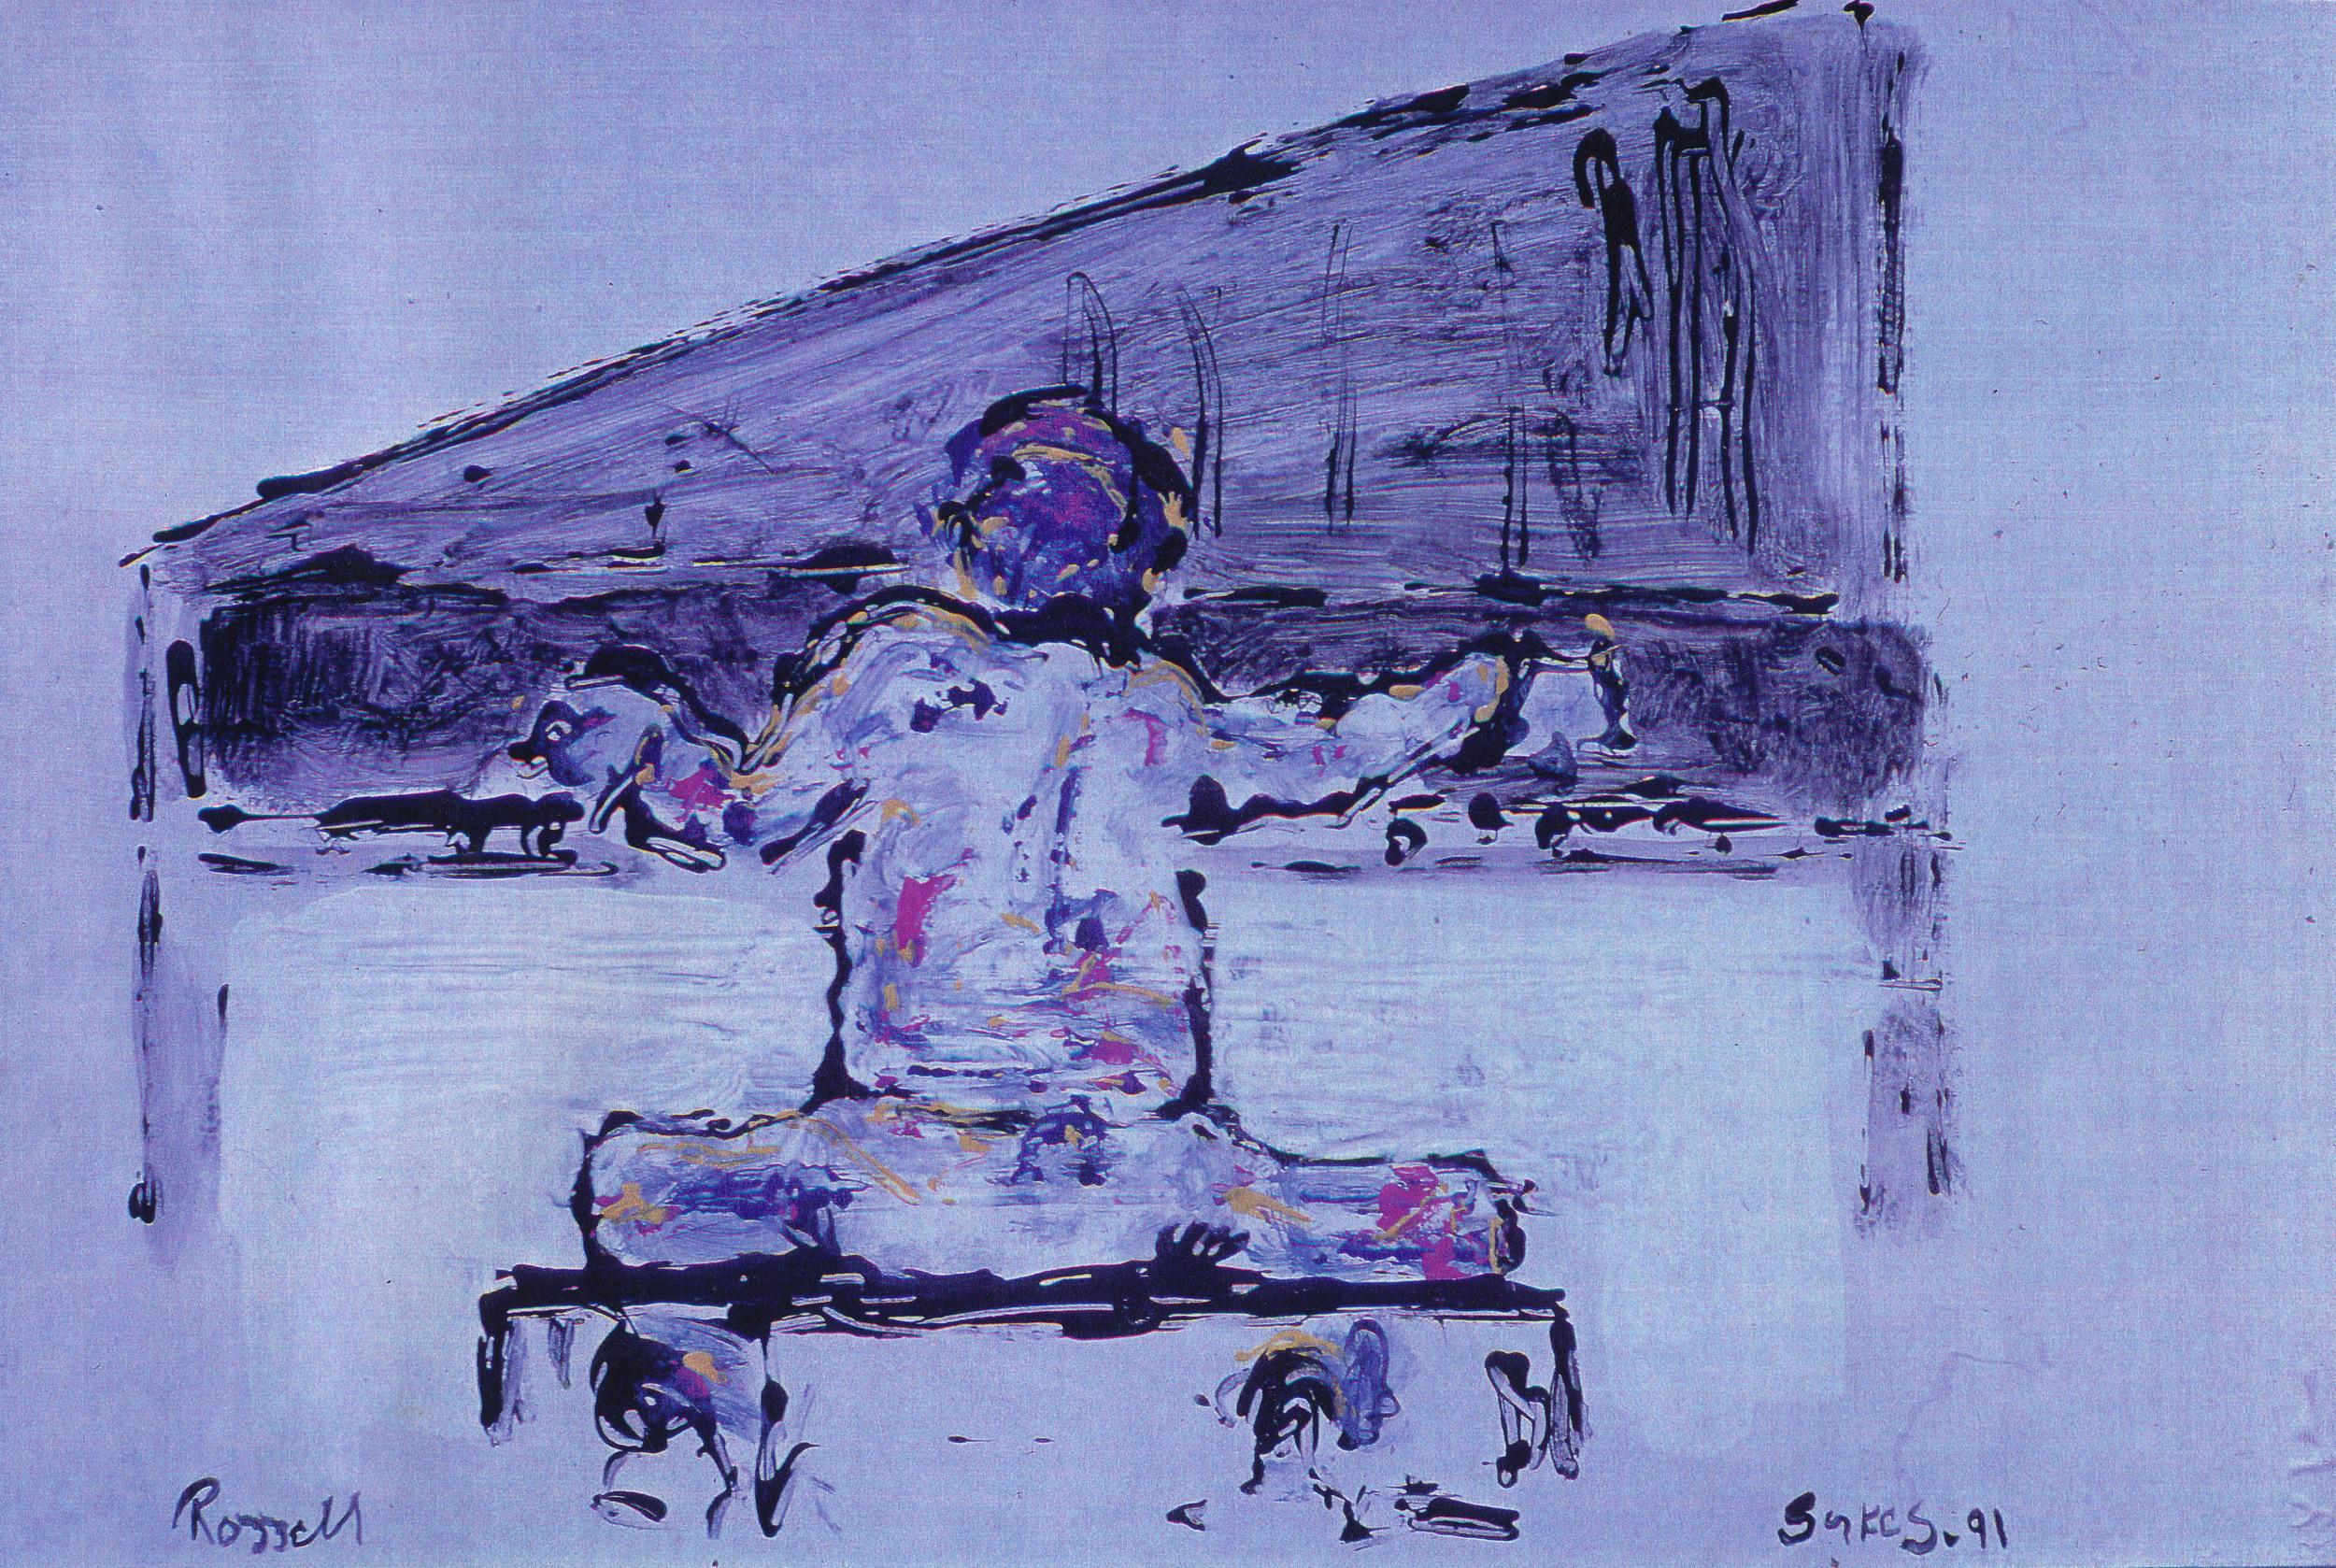 The Soloist, 1991